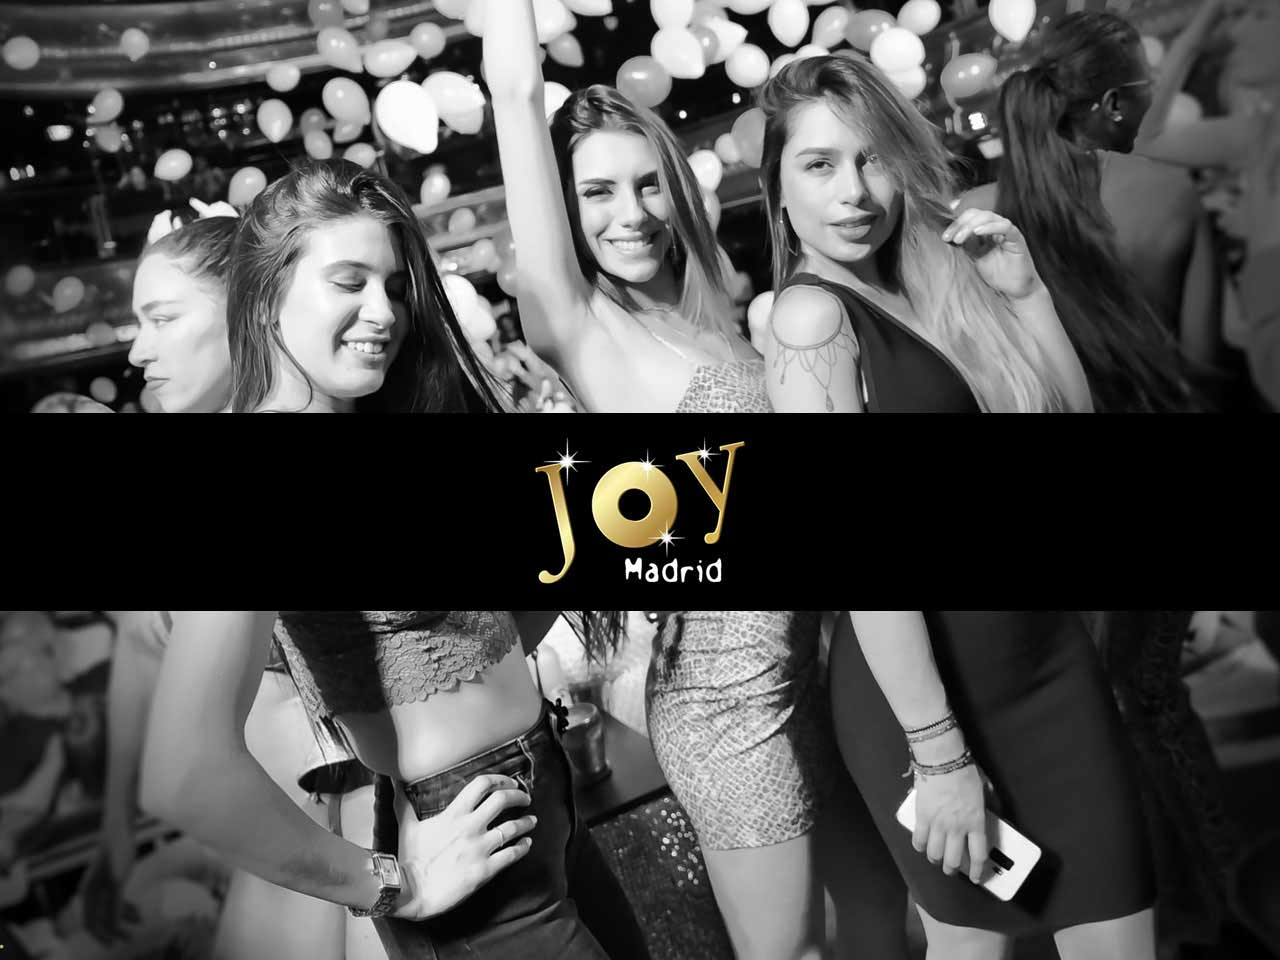 Joy Madrid Club